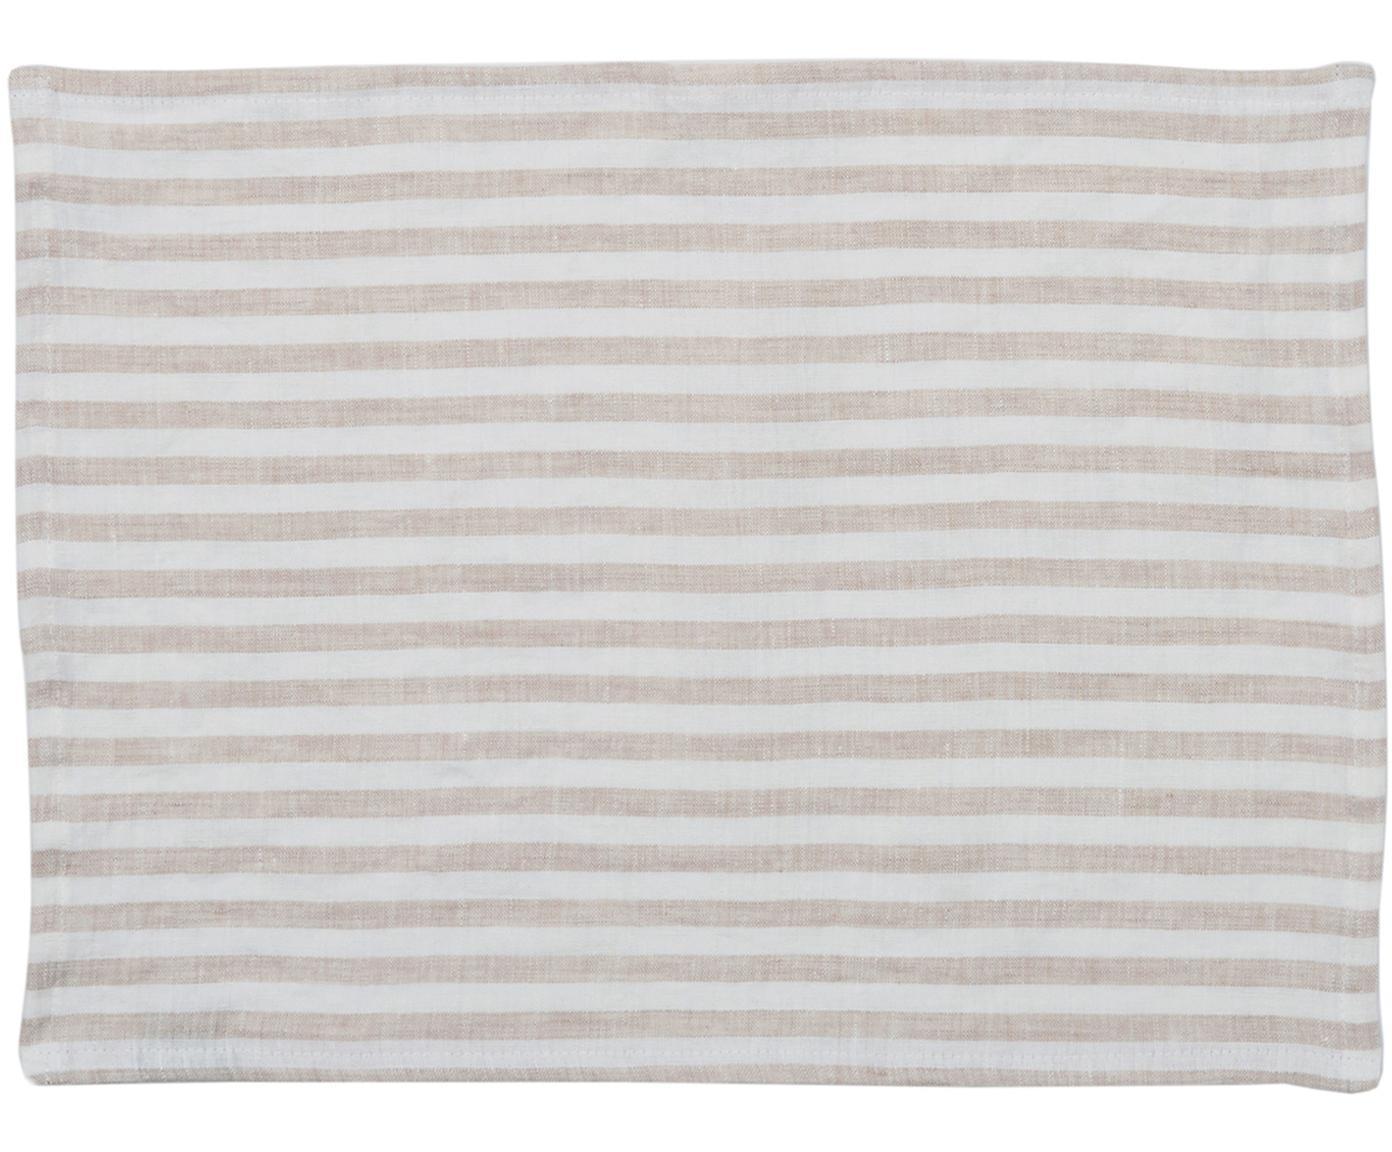 Tovaglietta americana in lino Solami 2 pz, Lino, Beige, bianco, Larg. 35 x Lung. 45 cm